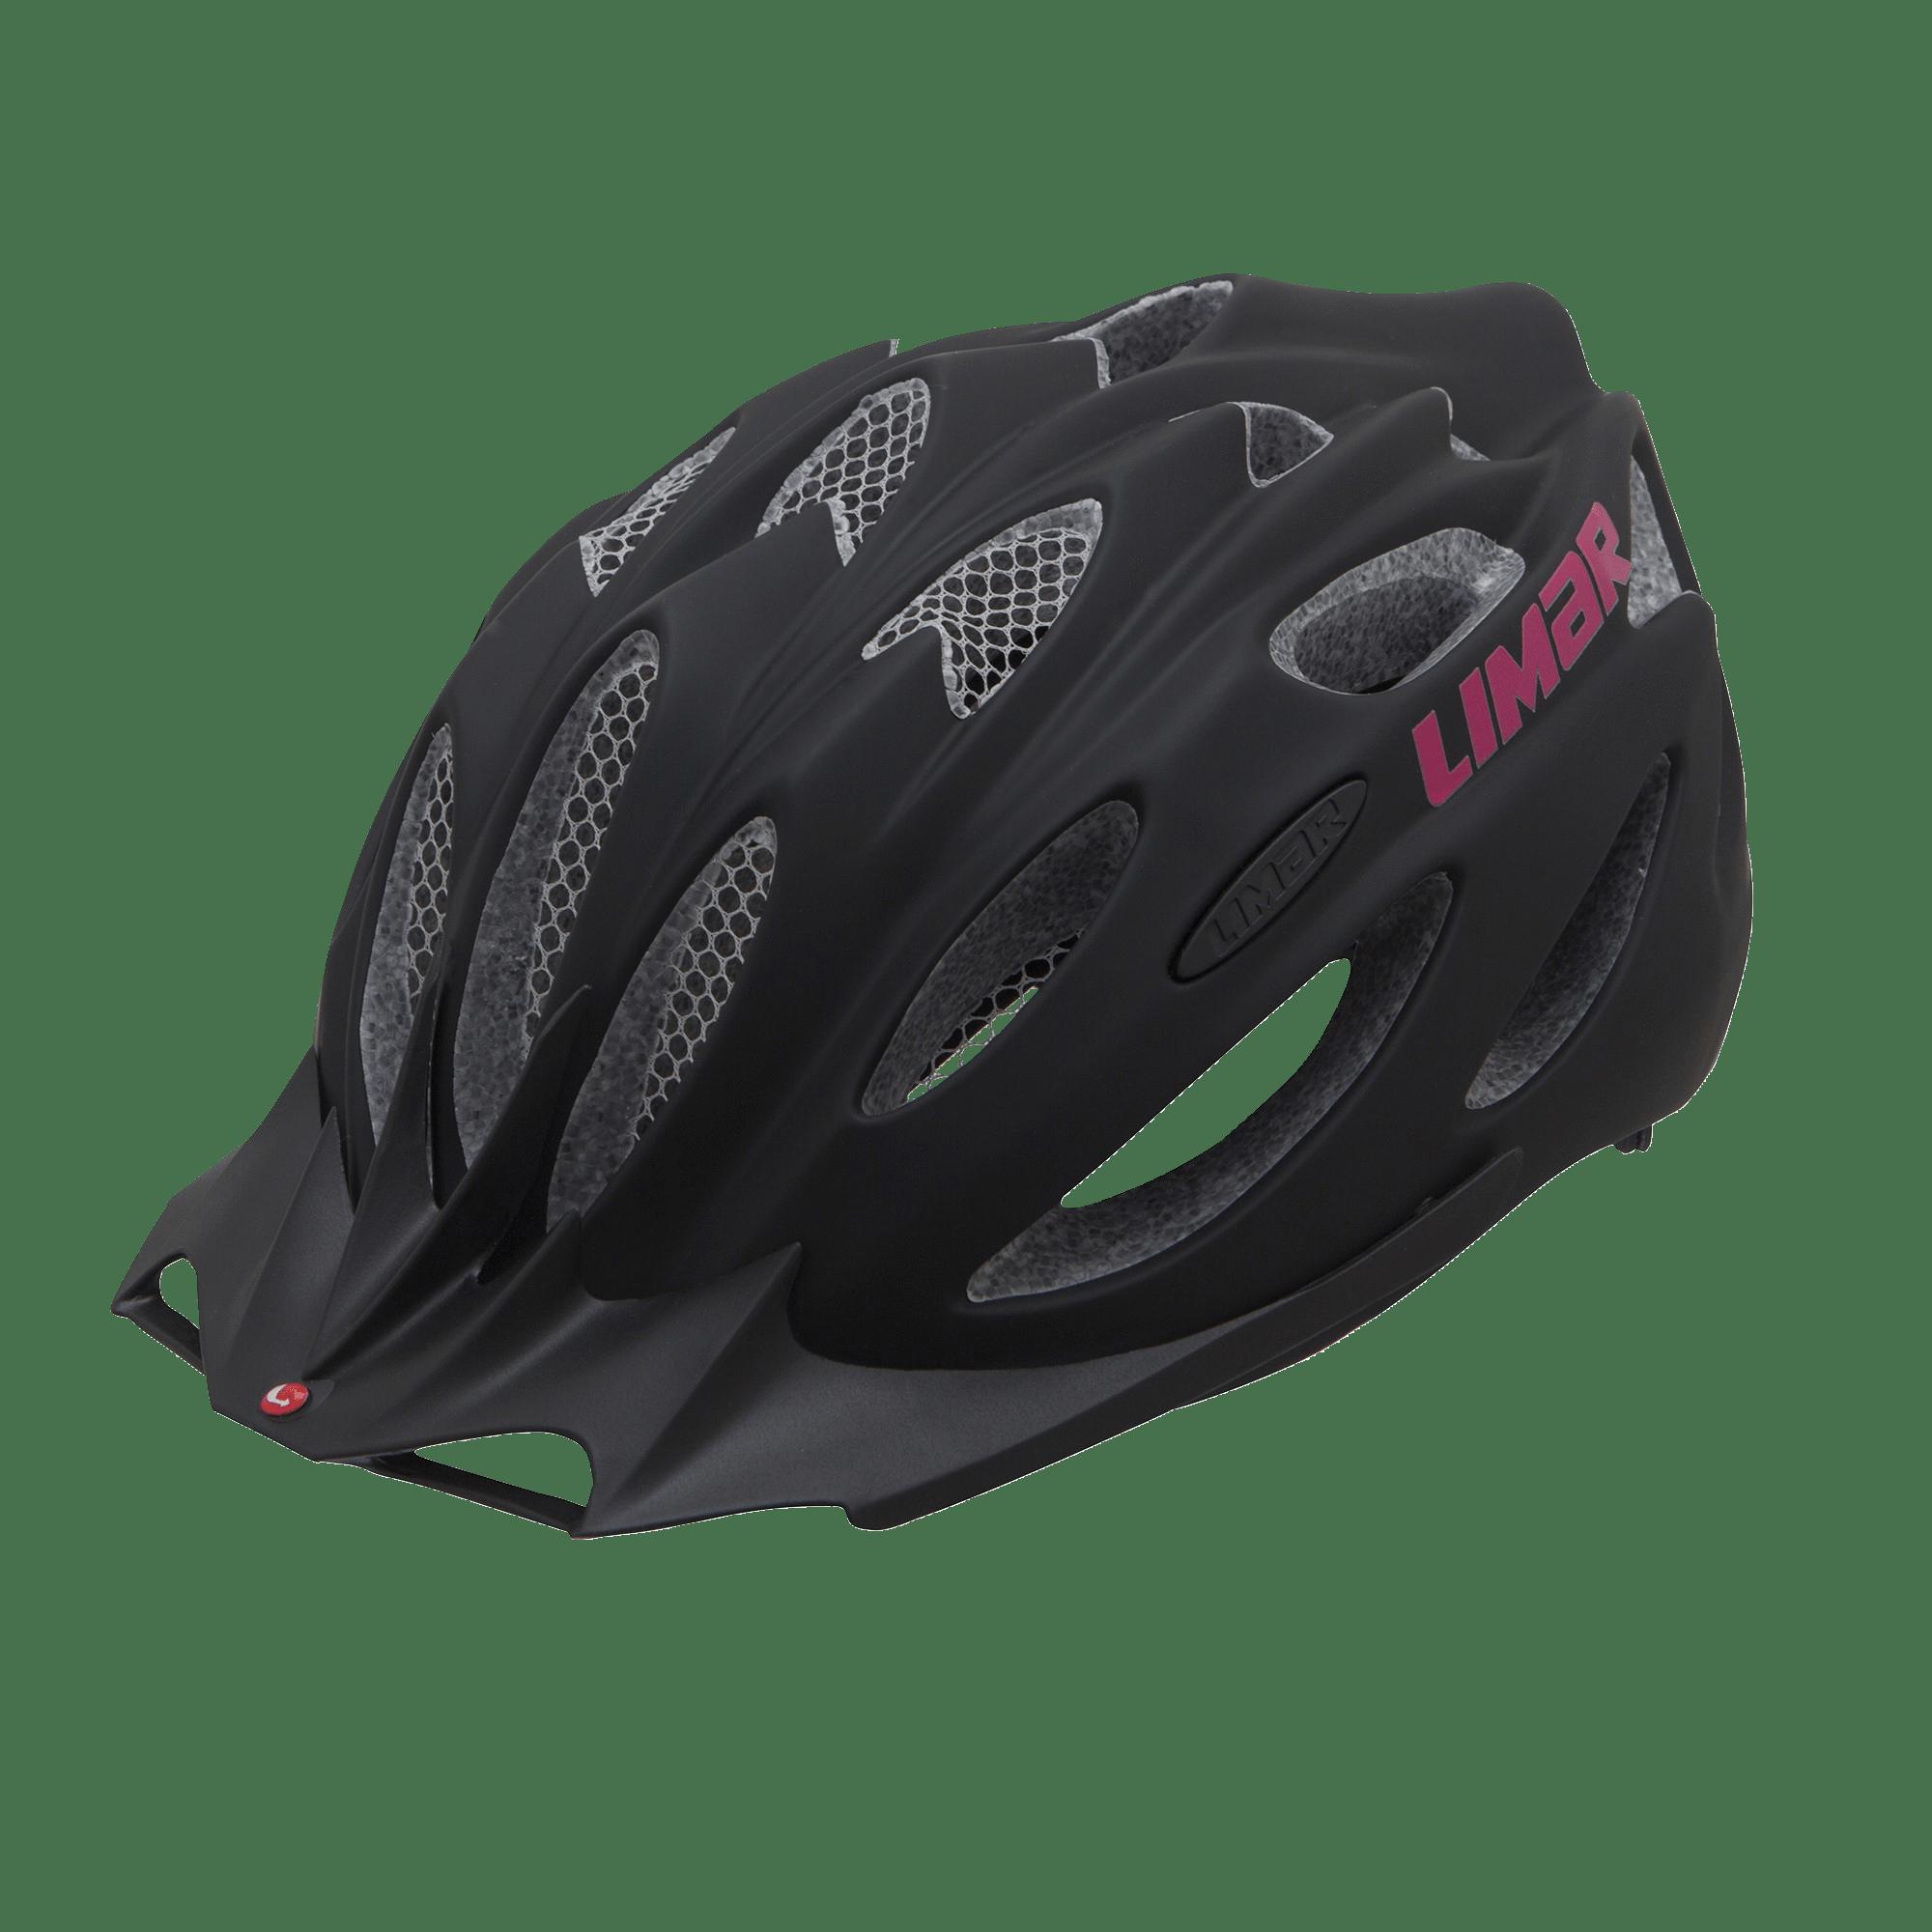 757 19, cykelhjelm, mountainbike, unisex, Sort | Helmets